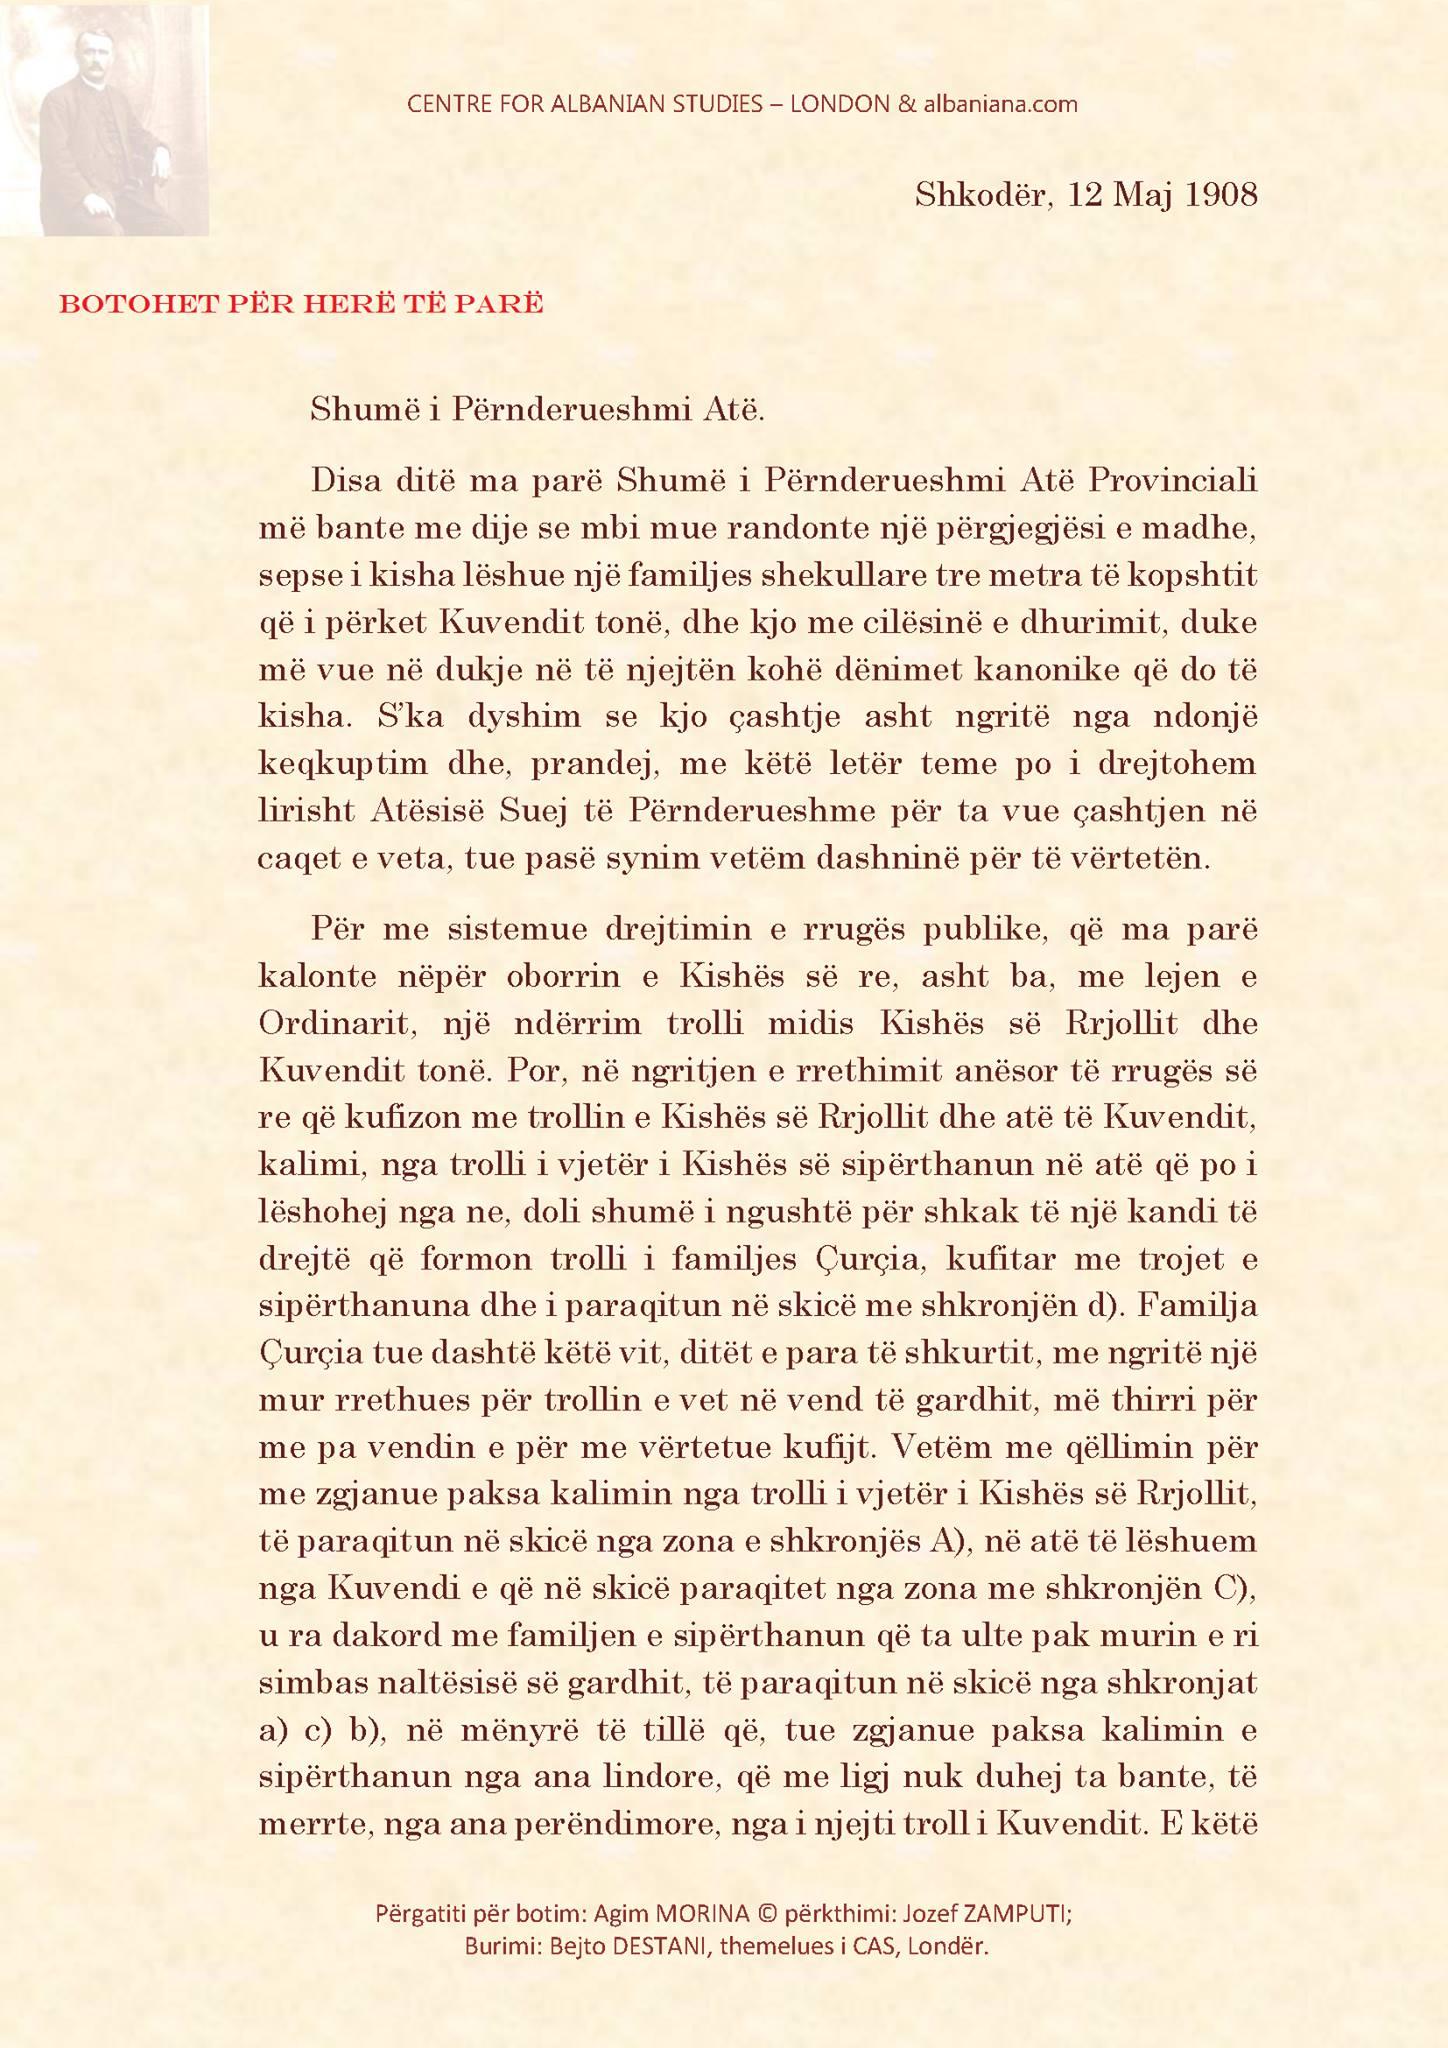 1908-05-12_fishta-1